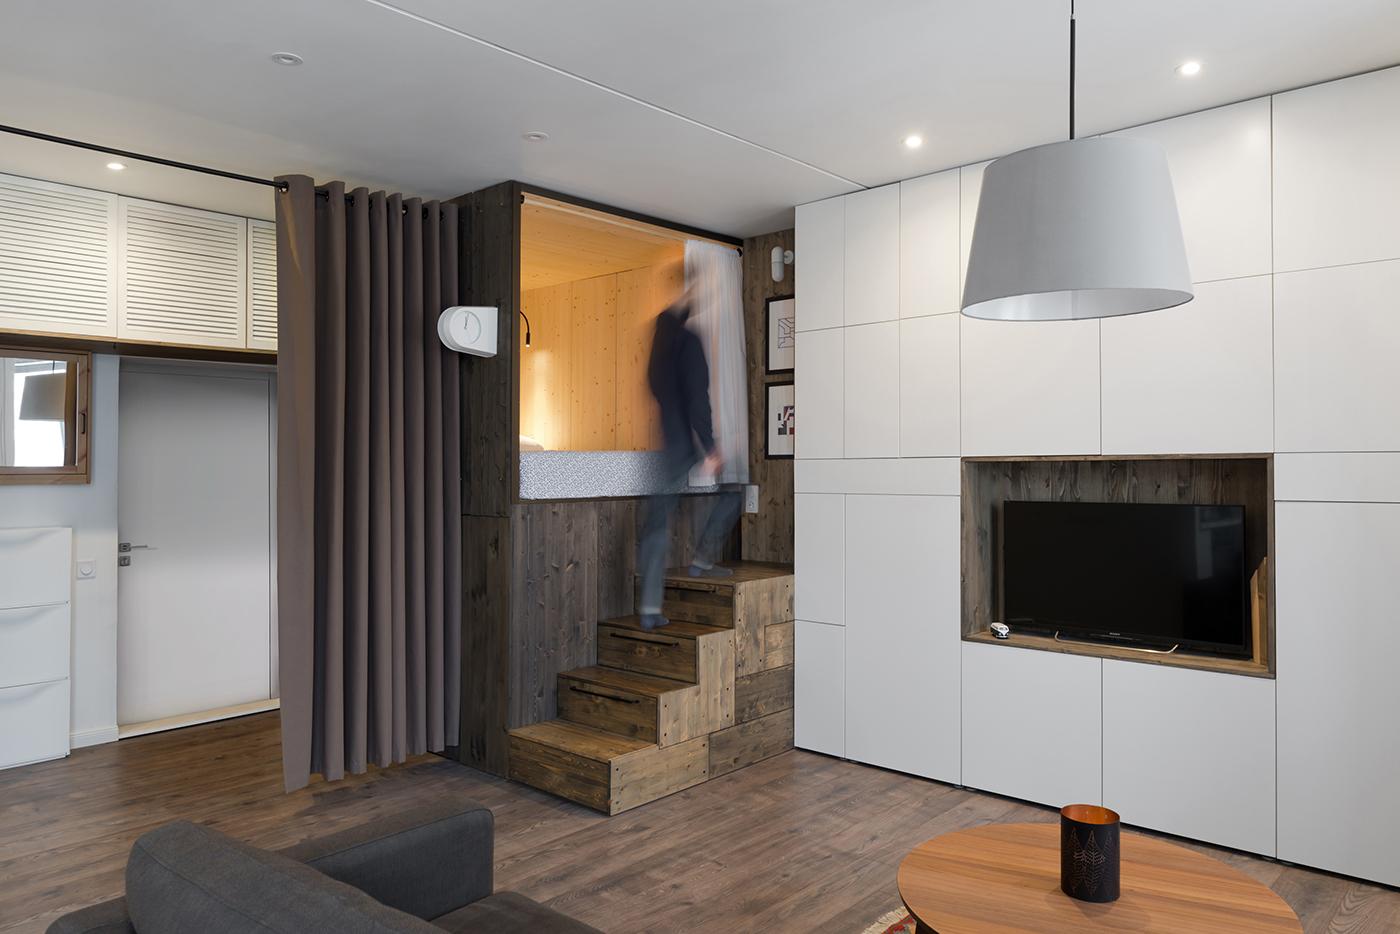 minimalist apartment Studio Bazi Creates Sleeping Box for Minimalist Apartment in Moscow Studio Bazi Creates Wooden Sleeping Box for Apartment in Moscow 5